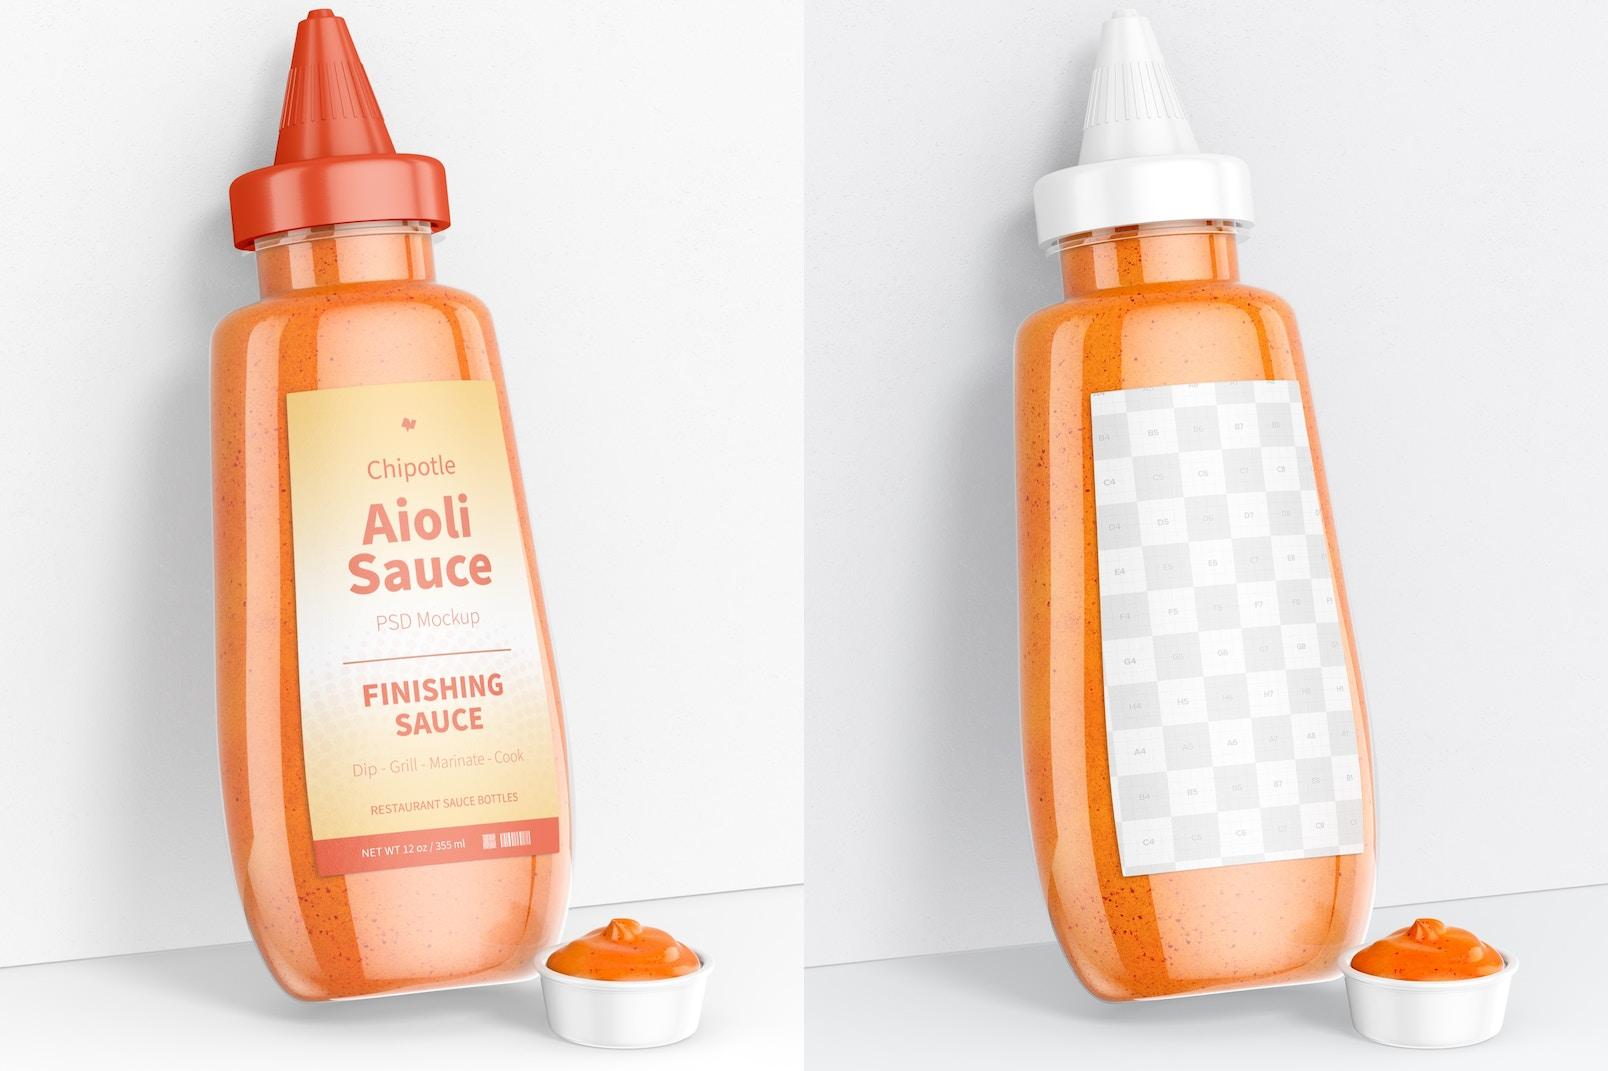 12 oz Chipotle Aioli Sauce Bottle Mockup, Leaned